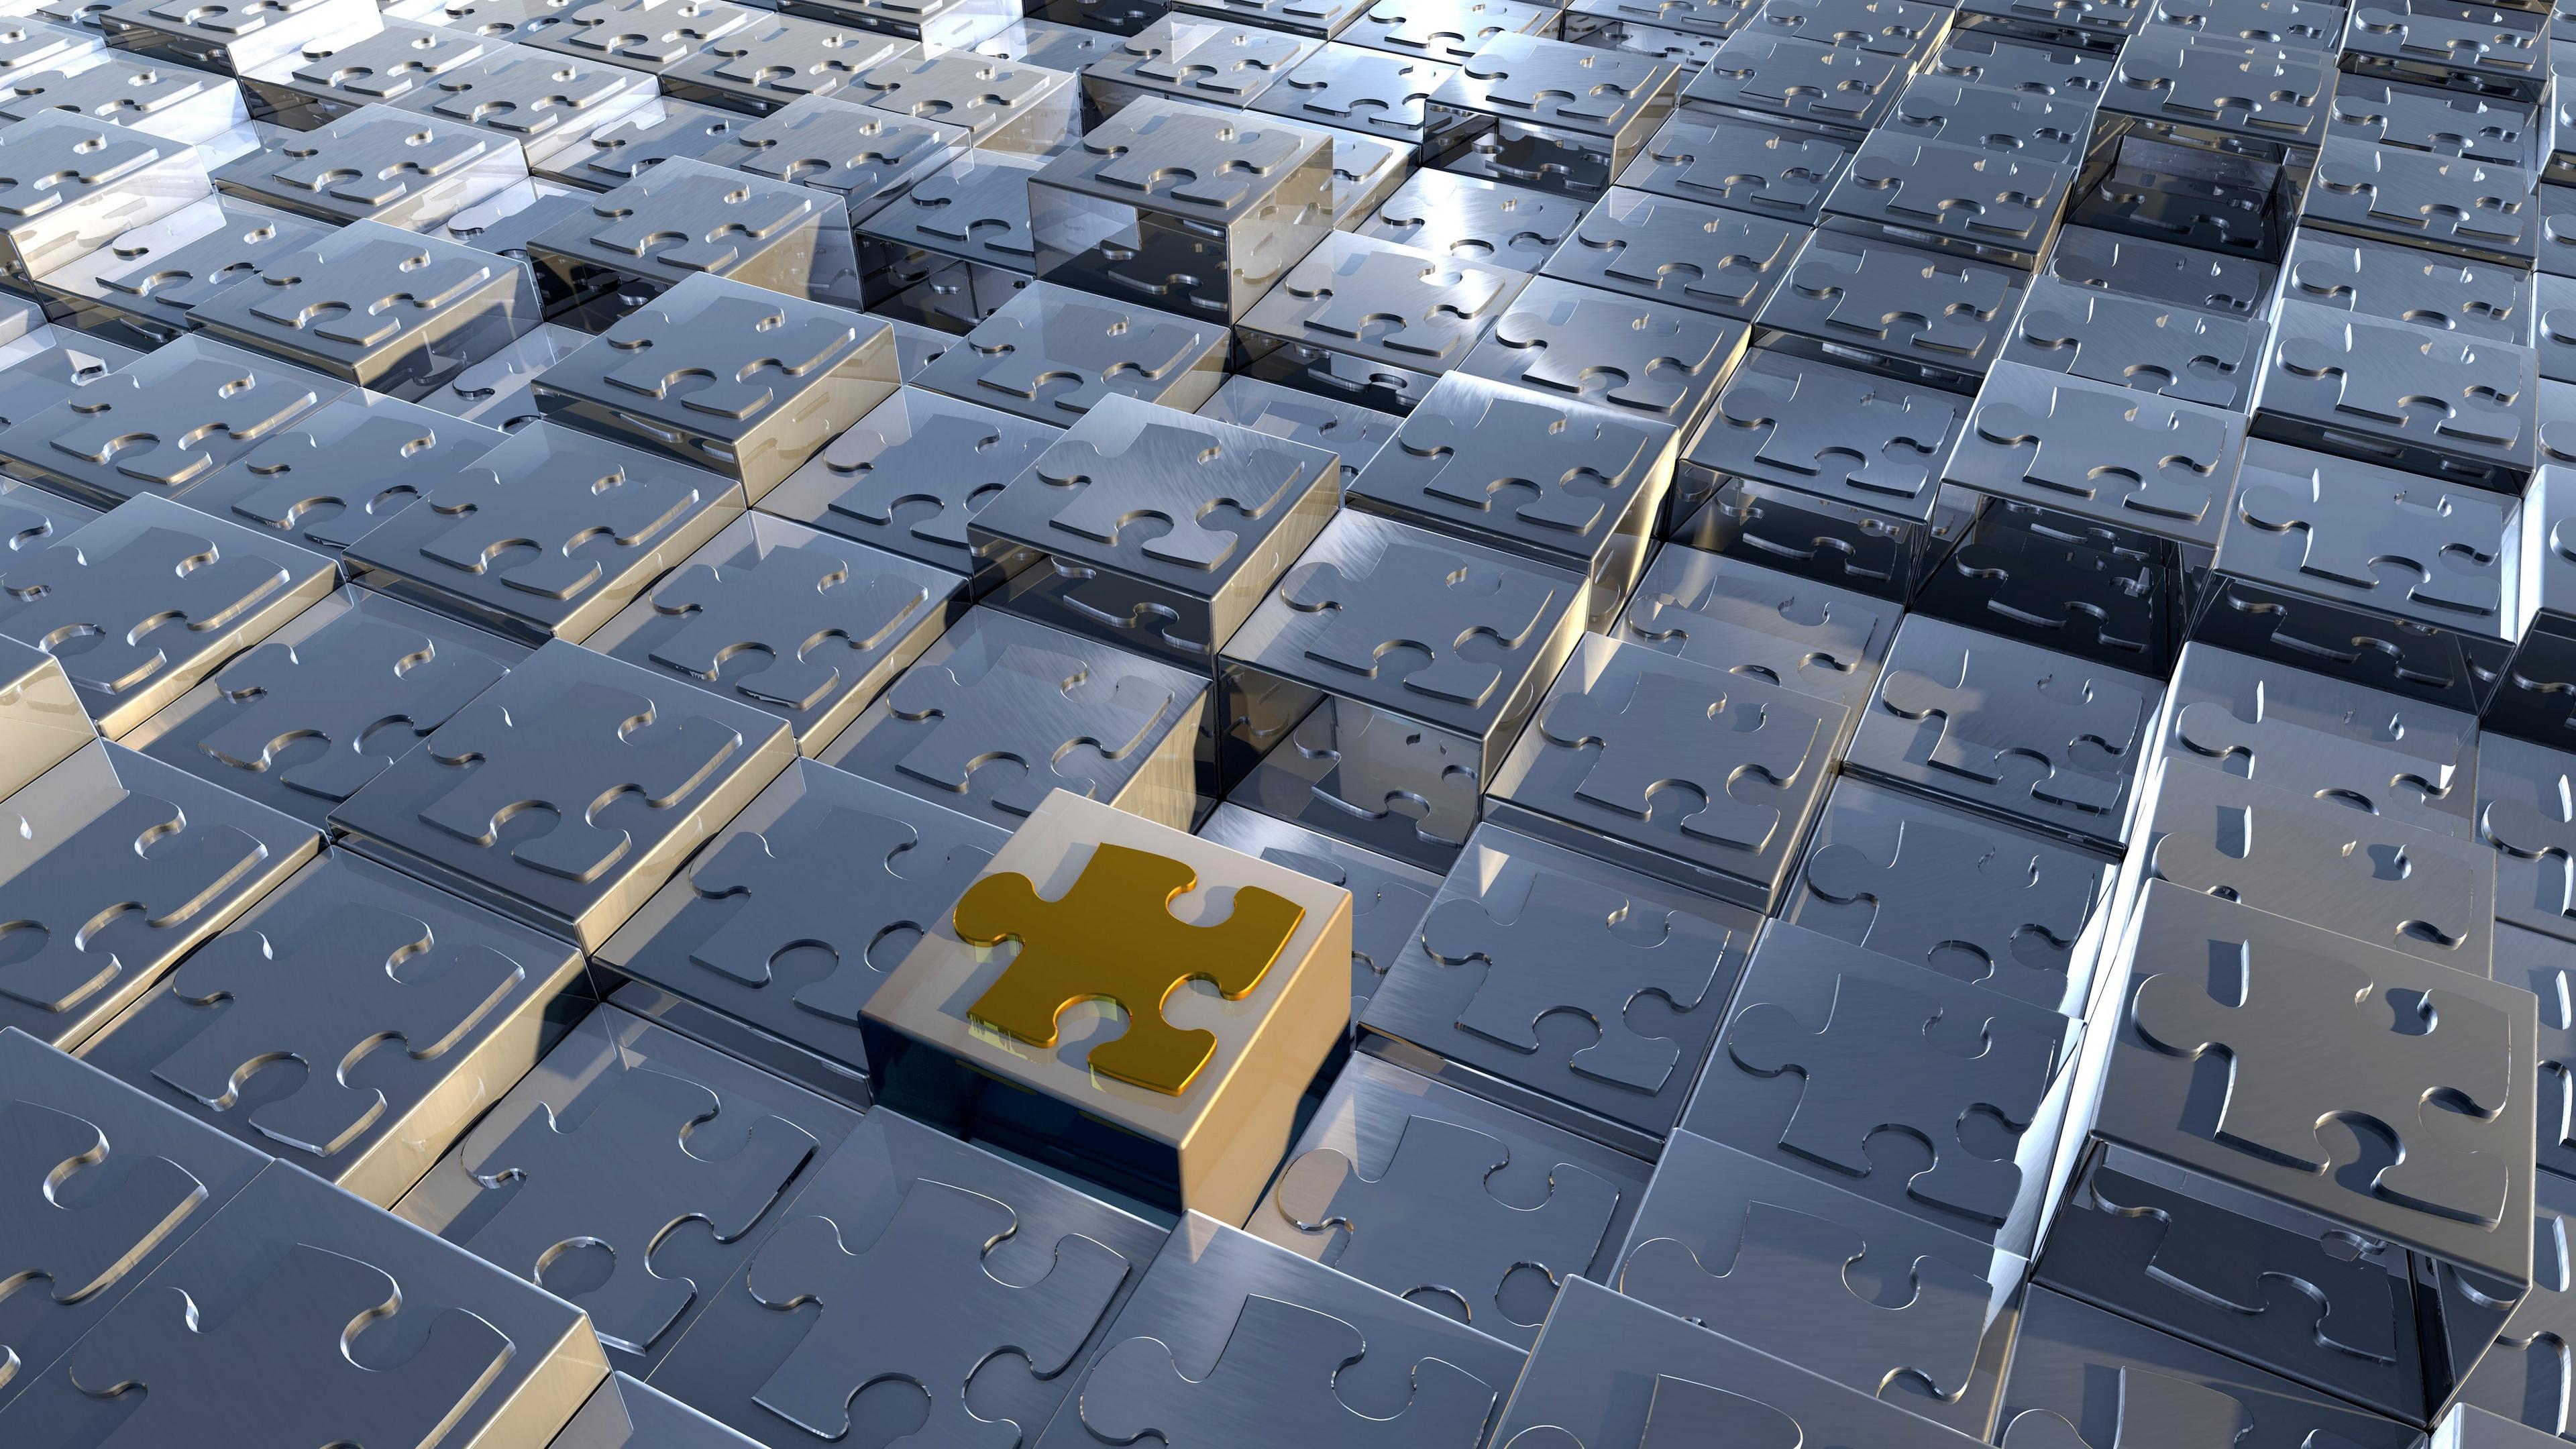 puzzles cubes metal 4k 1536854686 - puzzles, cubes, metal 4k - puzzles, Metal, Cubes